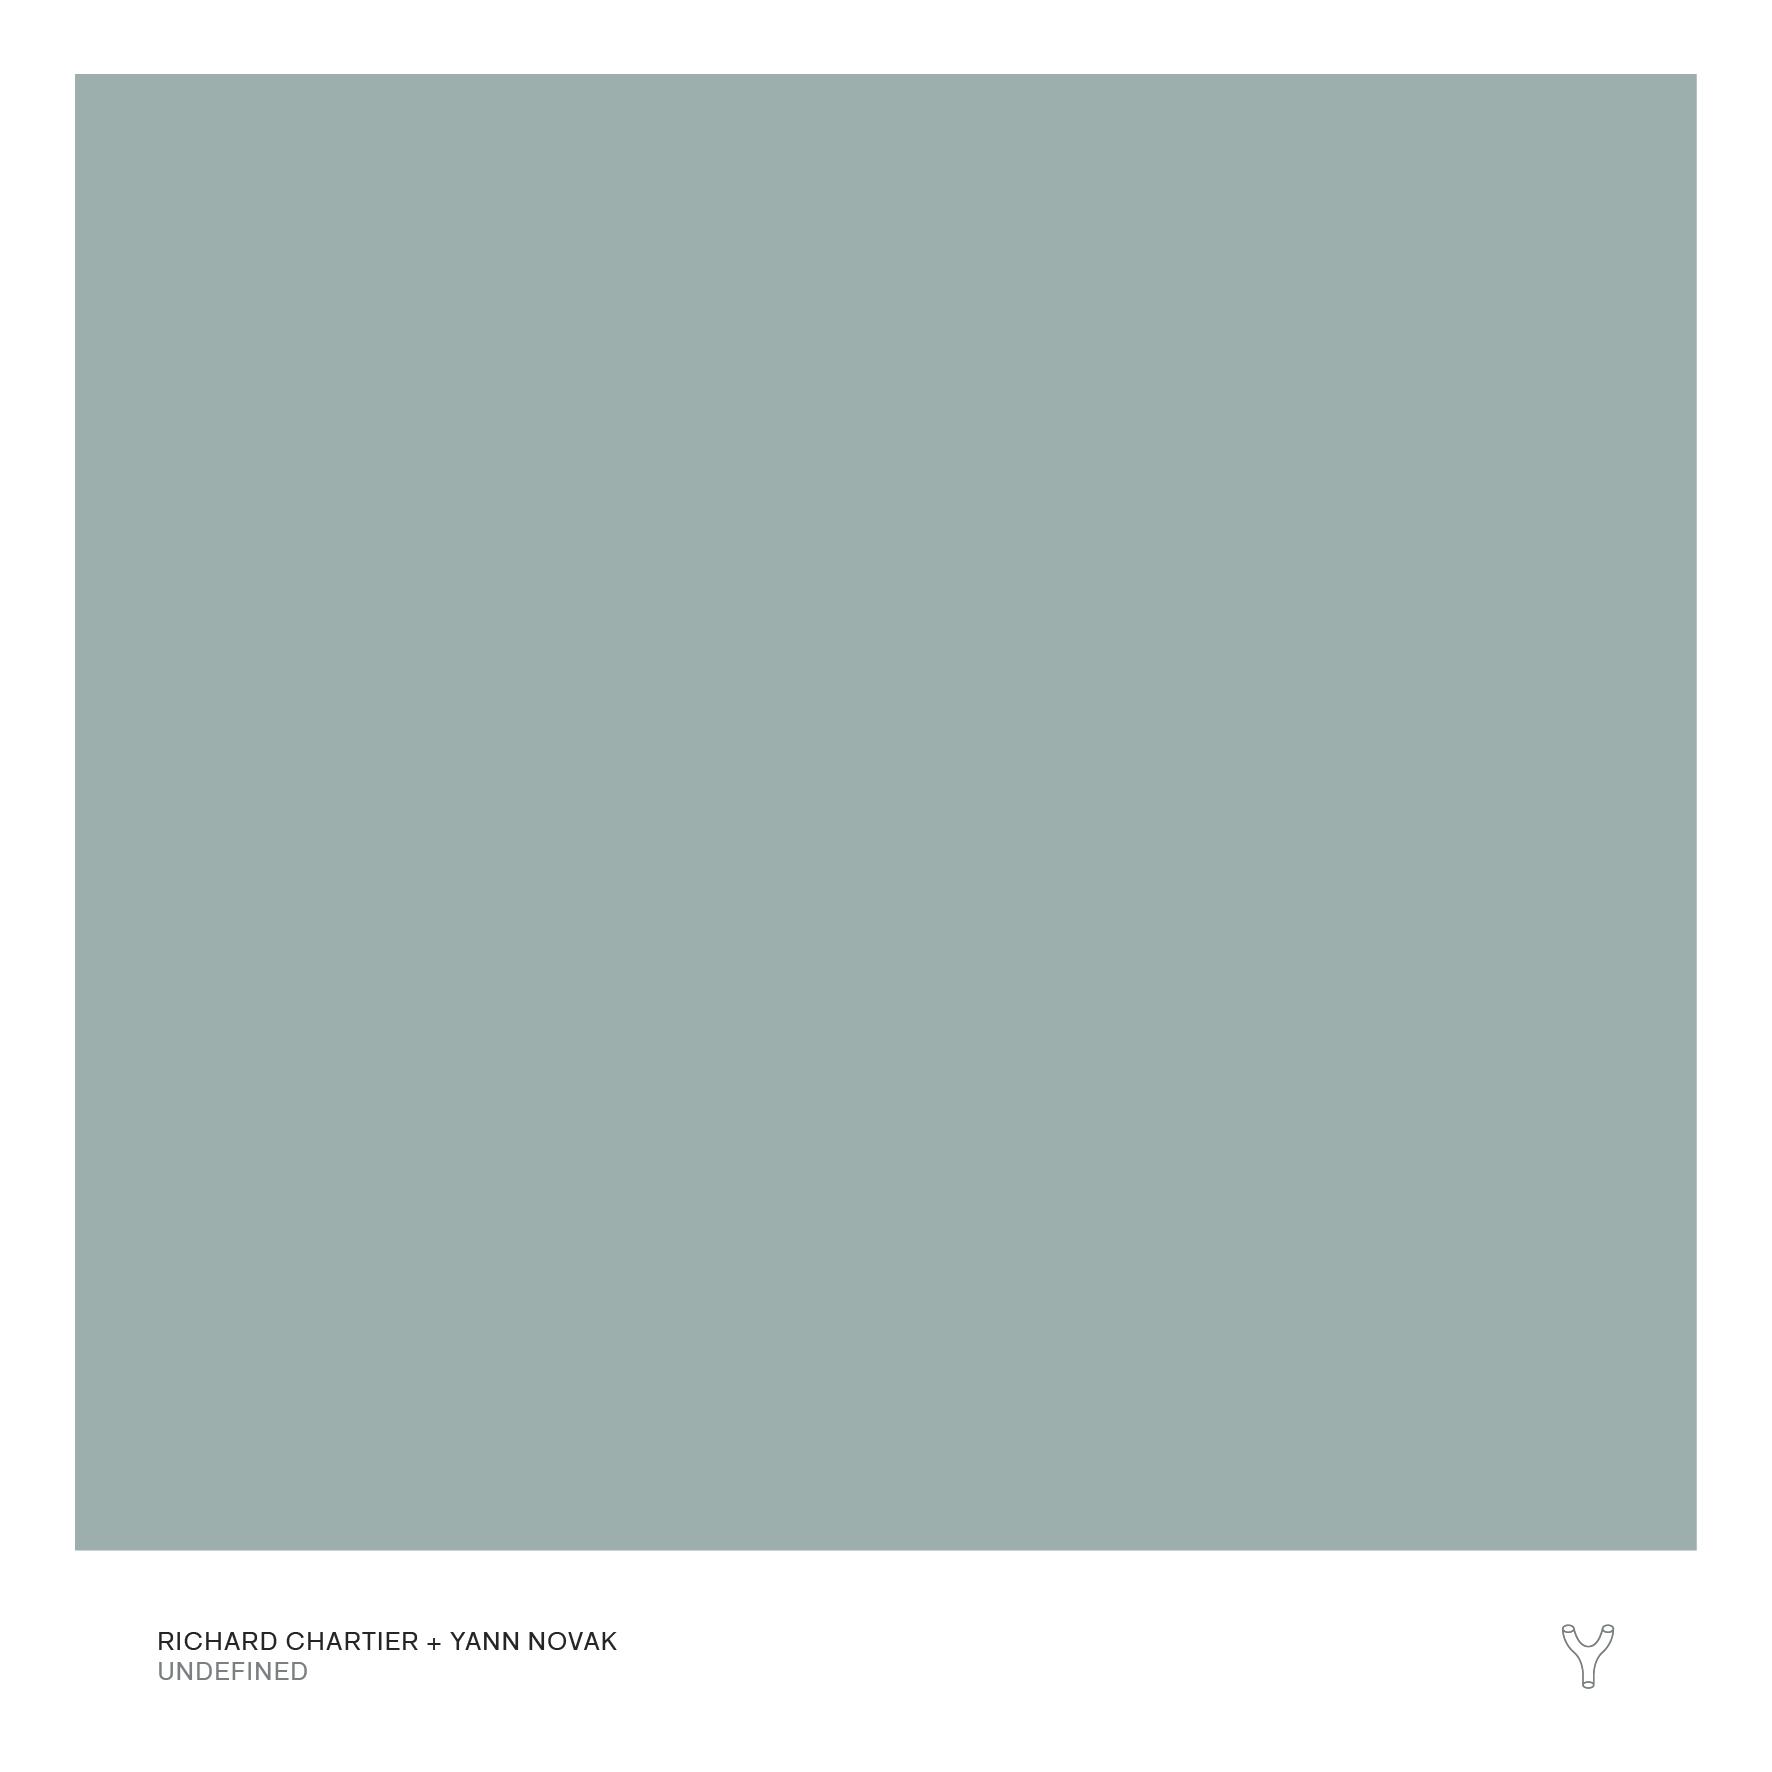 Richard Chartier + Yann Novak — Undefined